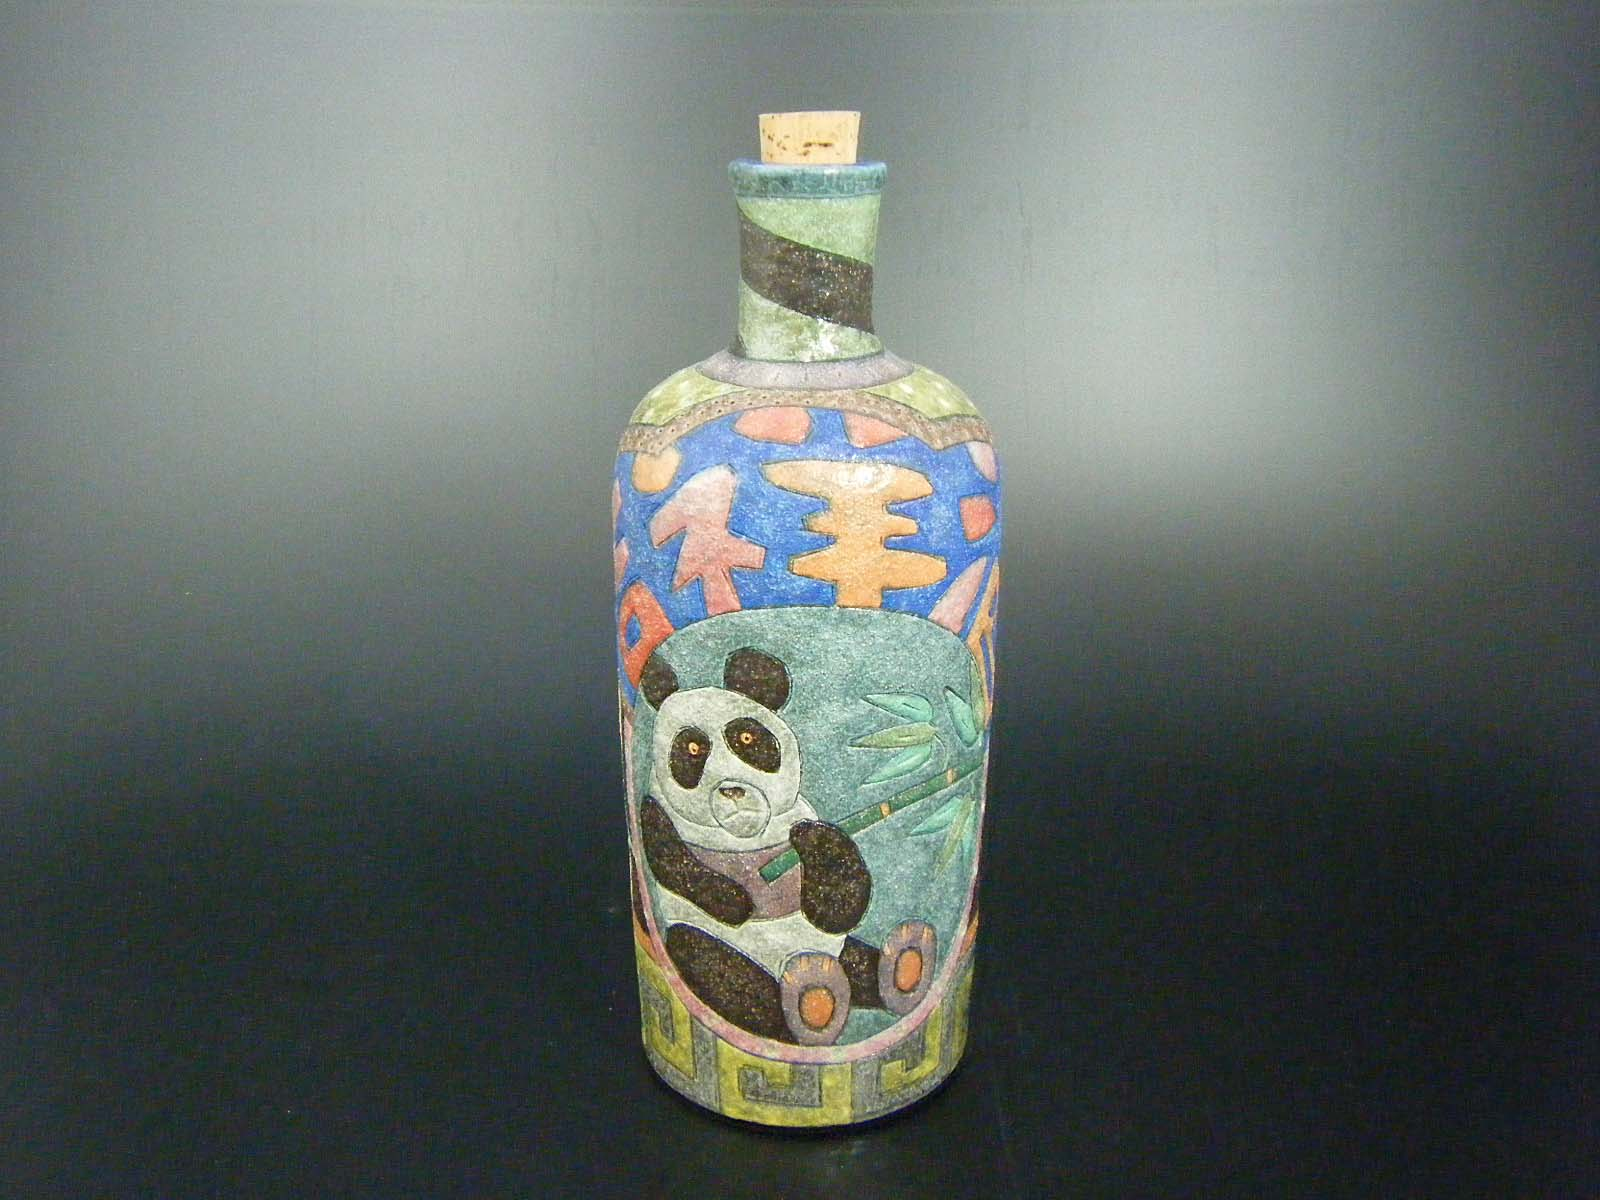 Pottery shizuoka gourmet page 3 wine bottle reviewsmspy